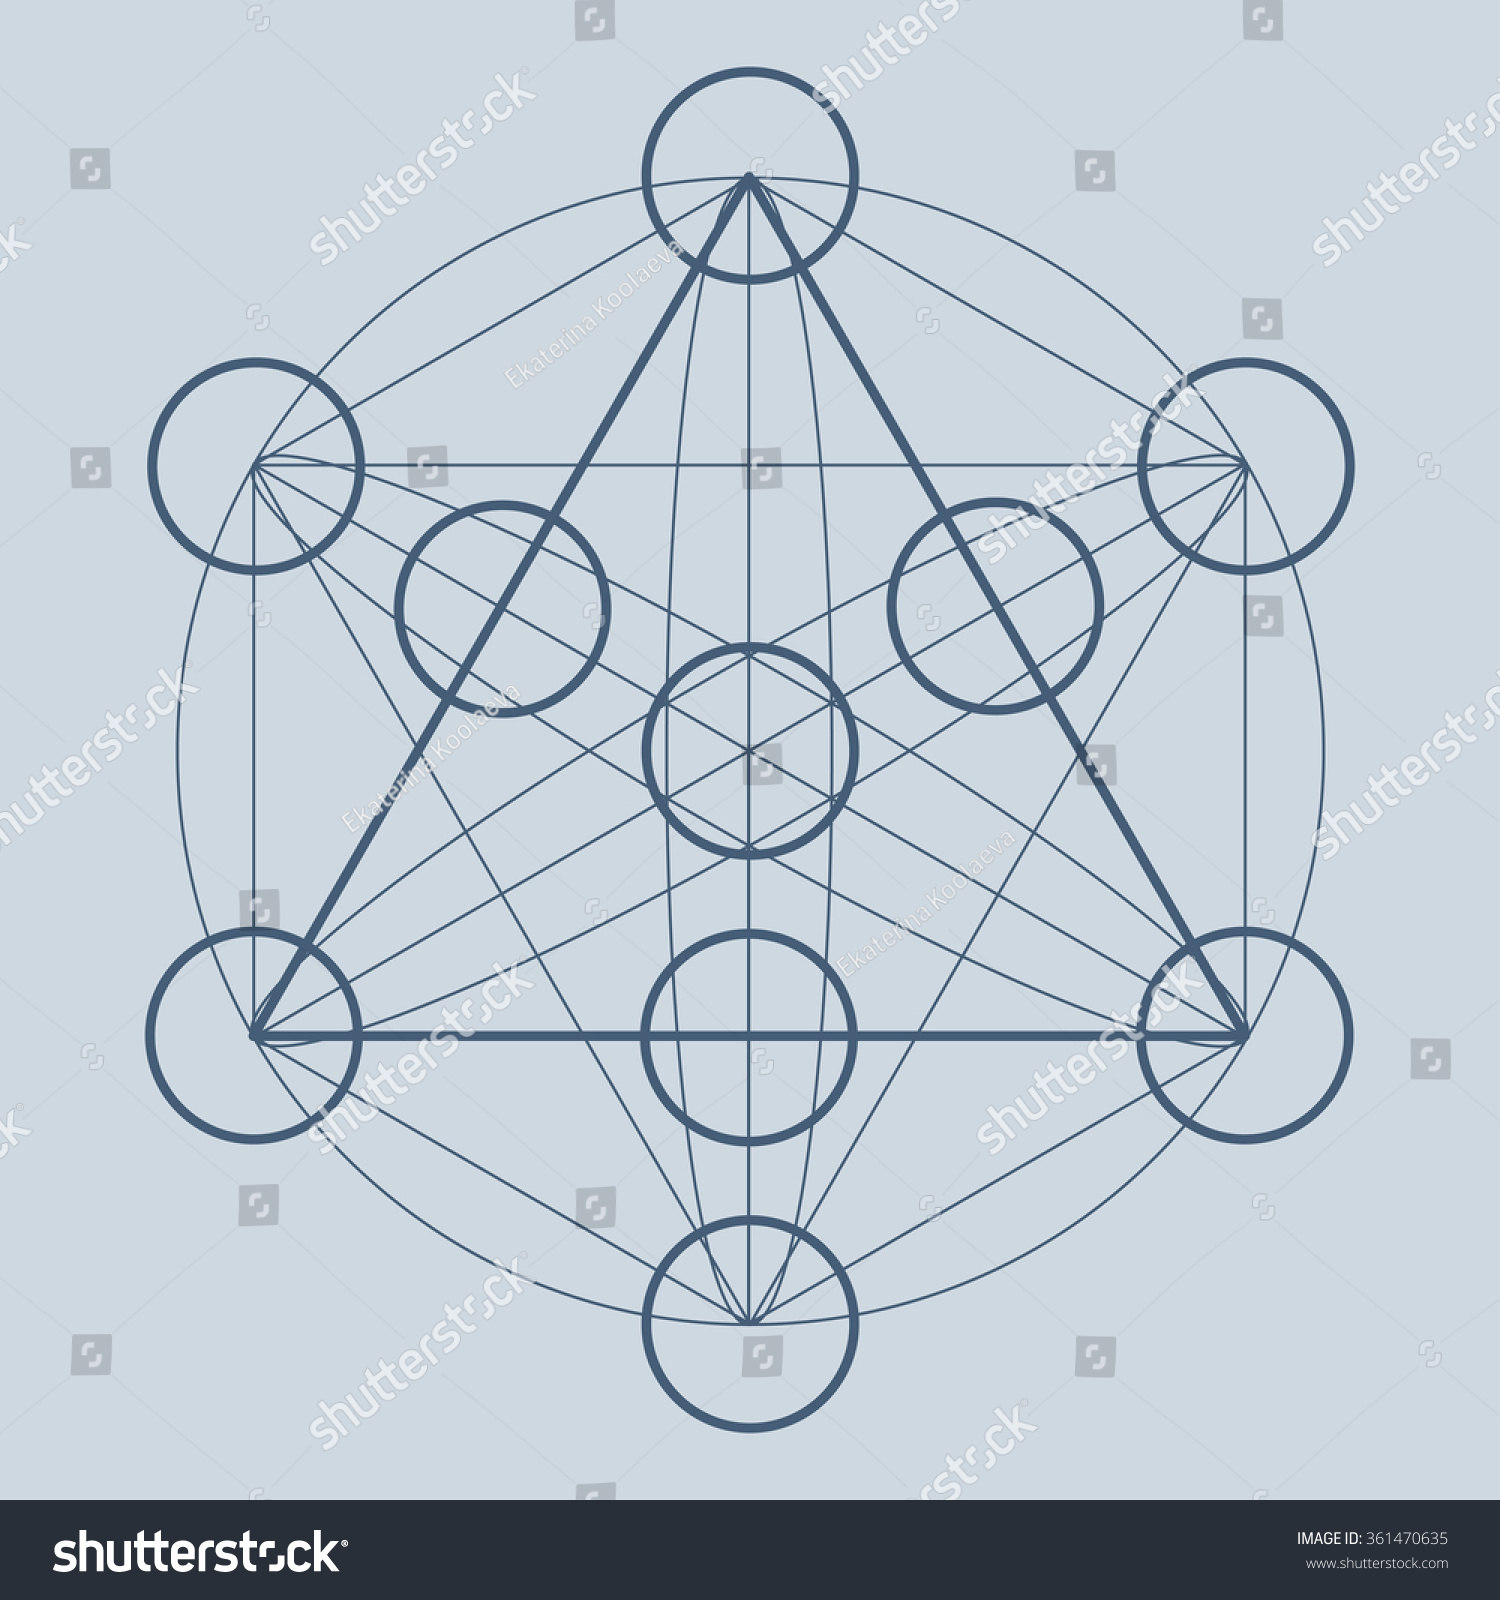 Sacred geometry symbol alchemy science religion stock vector sacred geometry symbol alchemy science religion philosophy astrology and spirituality themes biocorpaavc